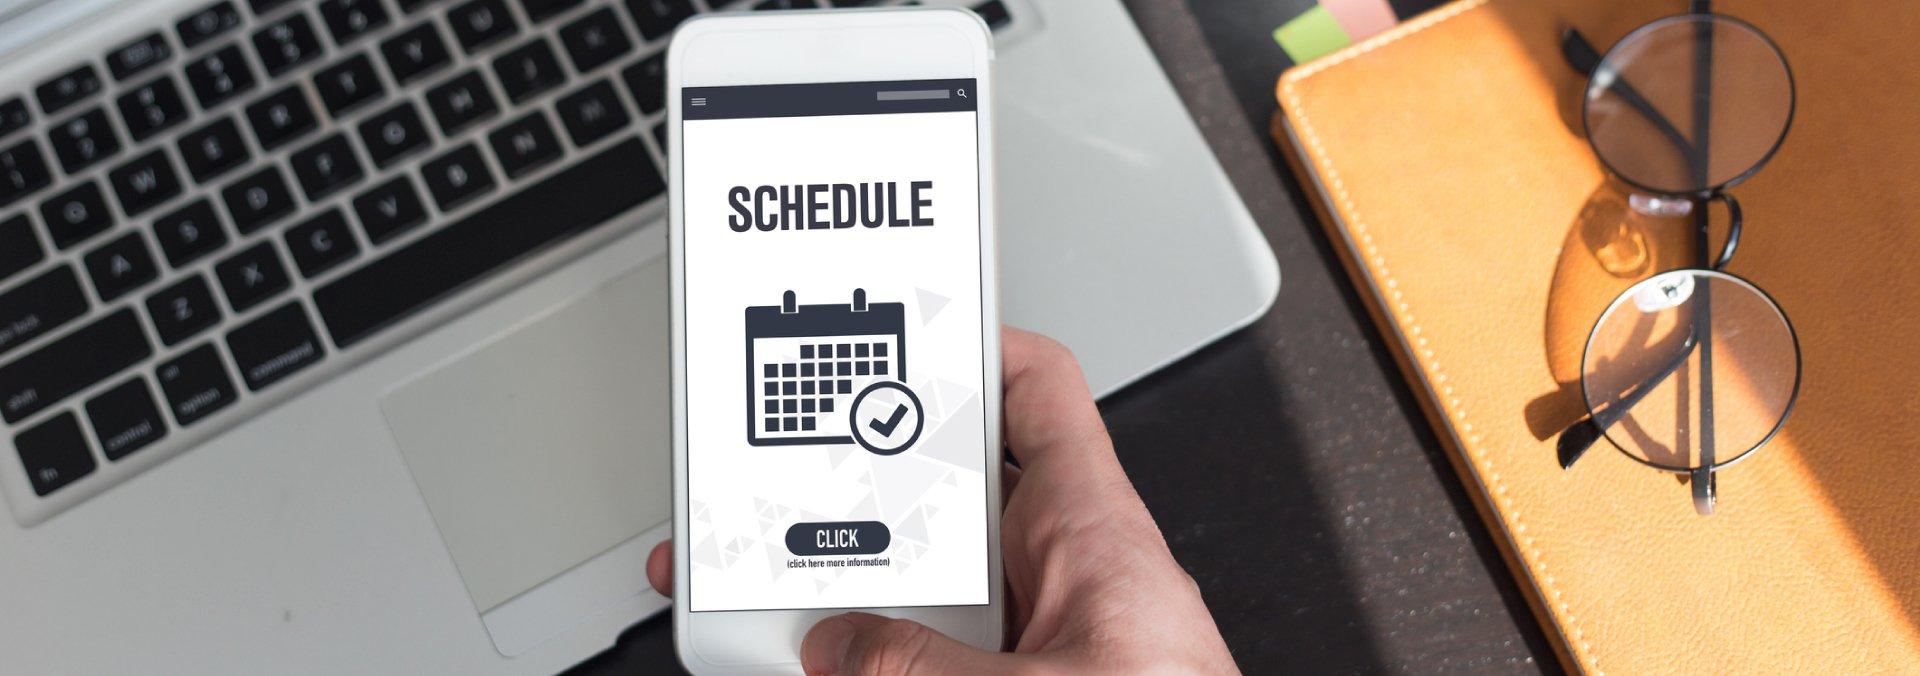 time management online app